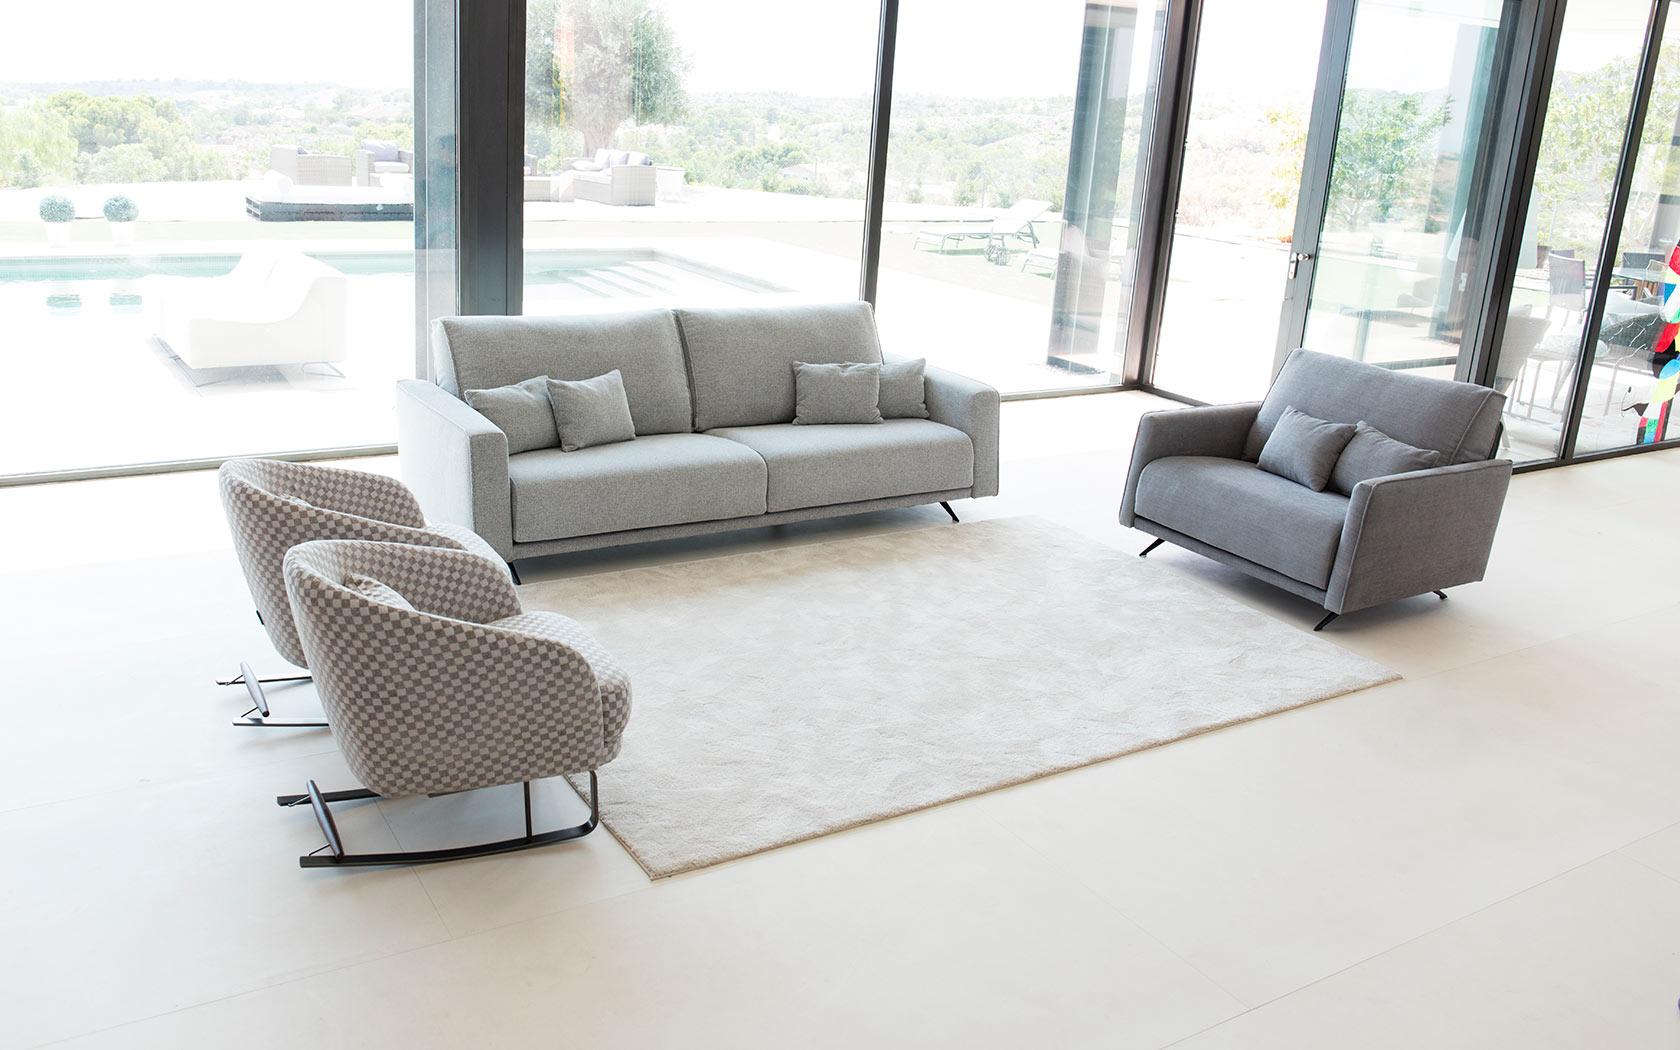 Boston sofa Fama 2019 04